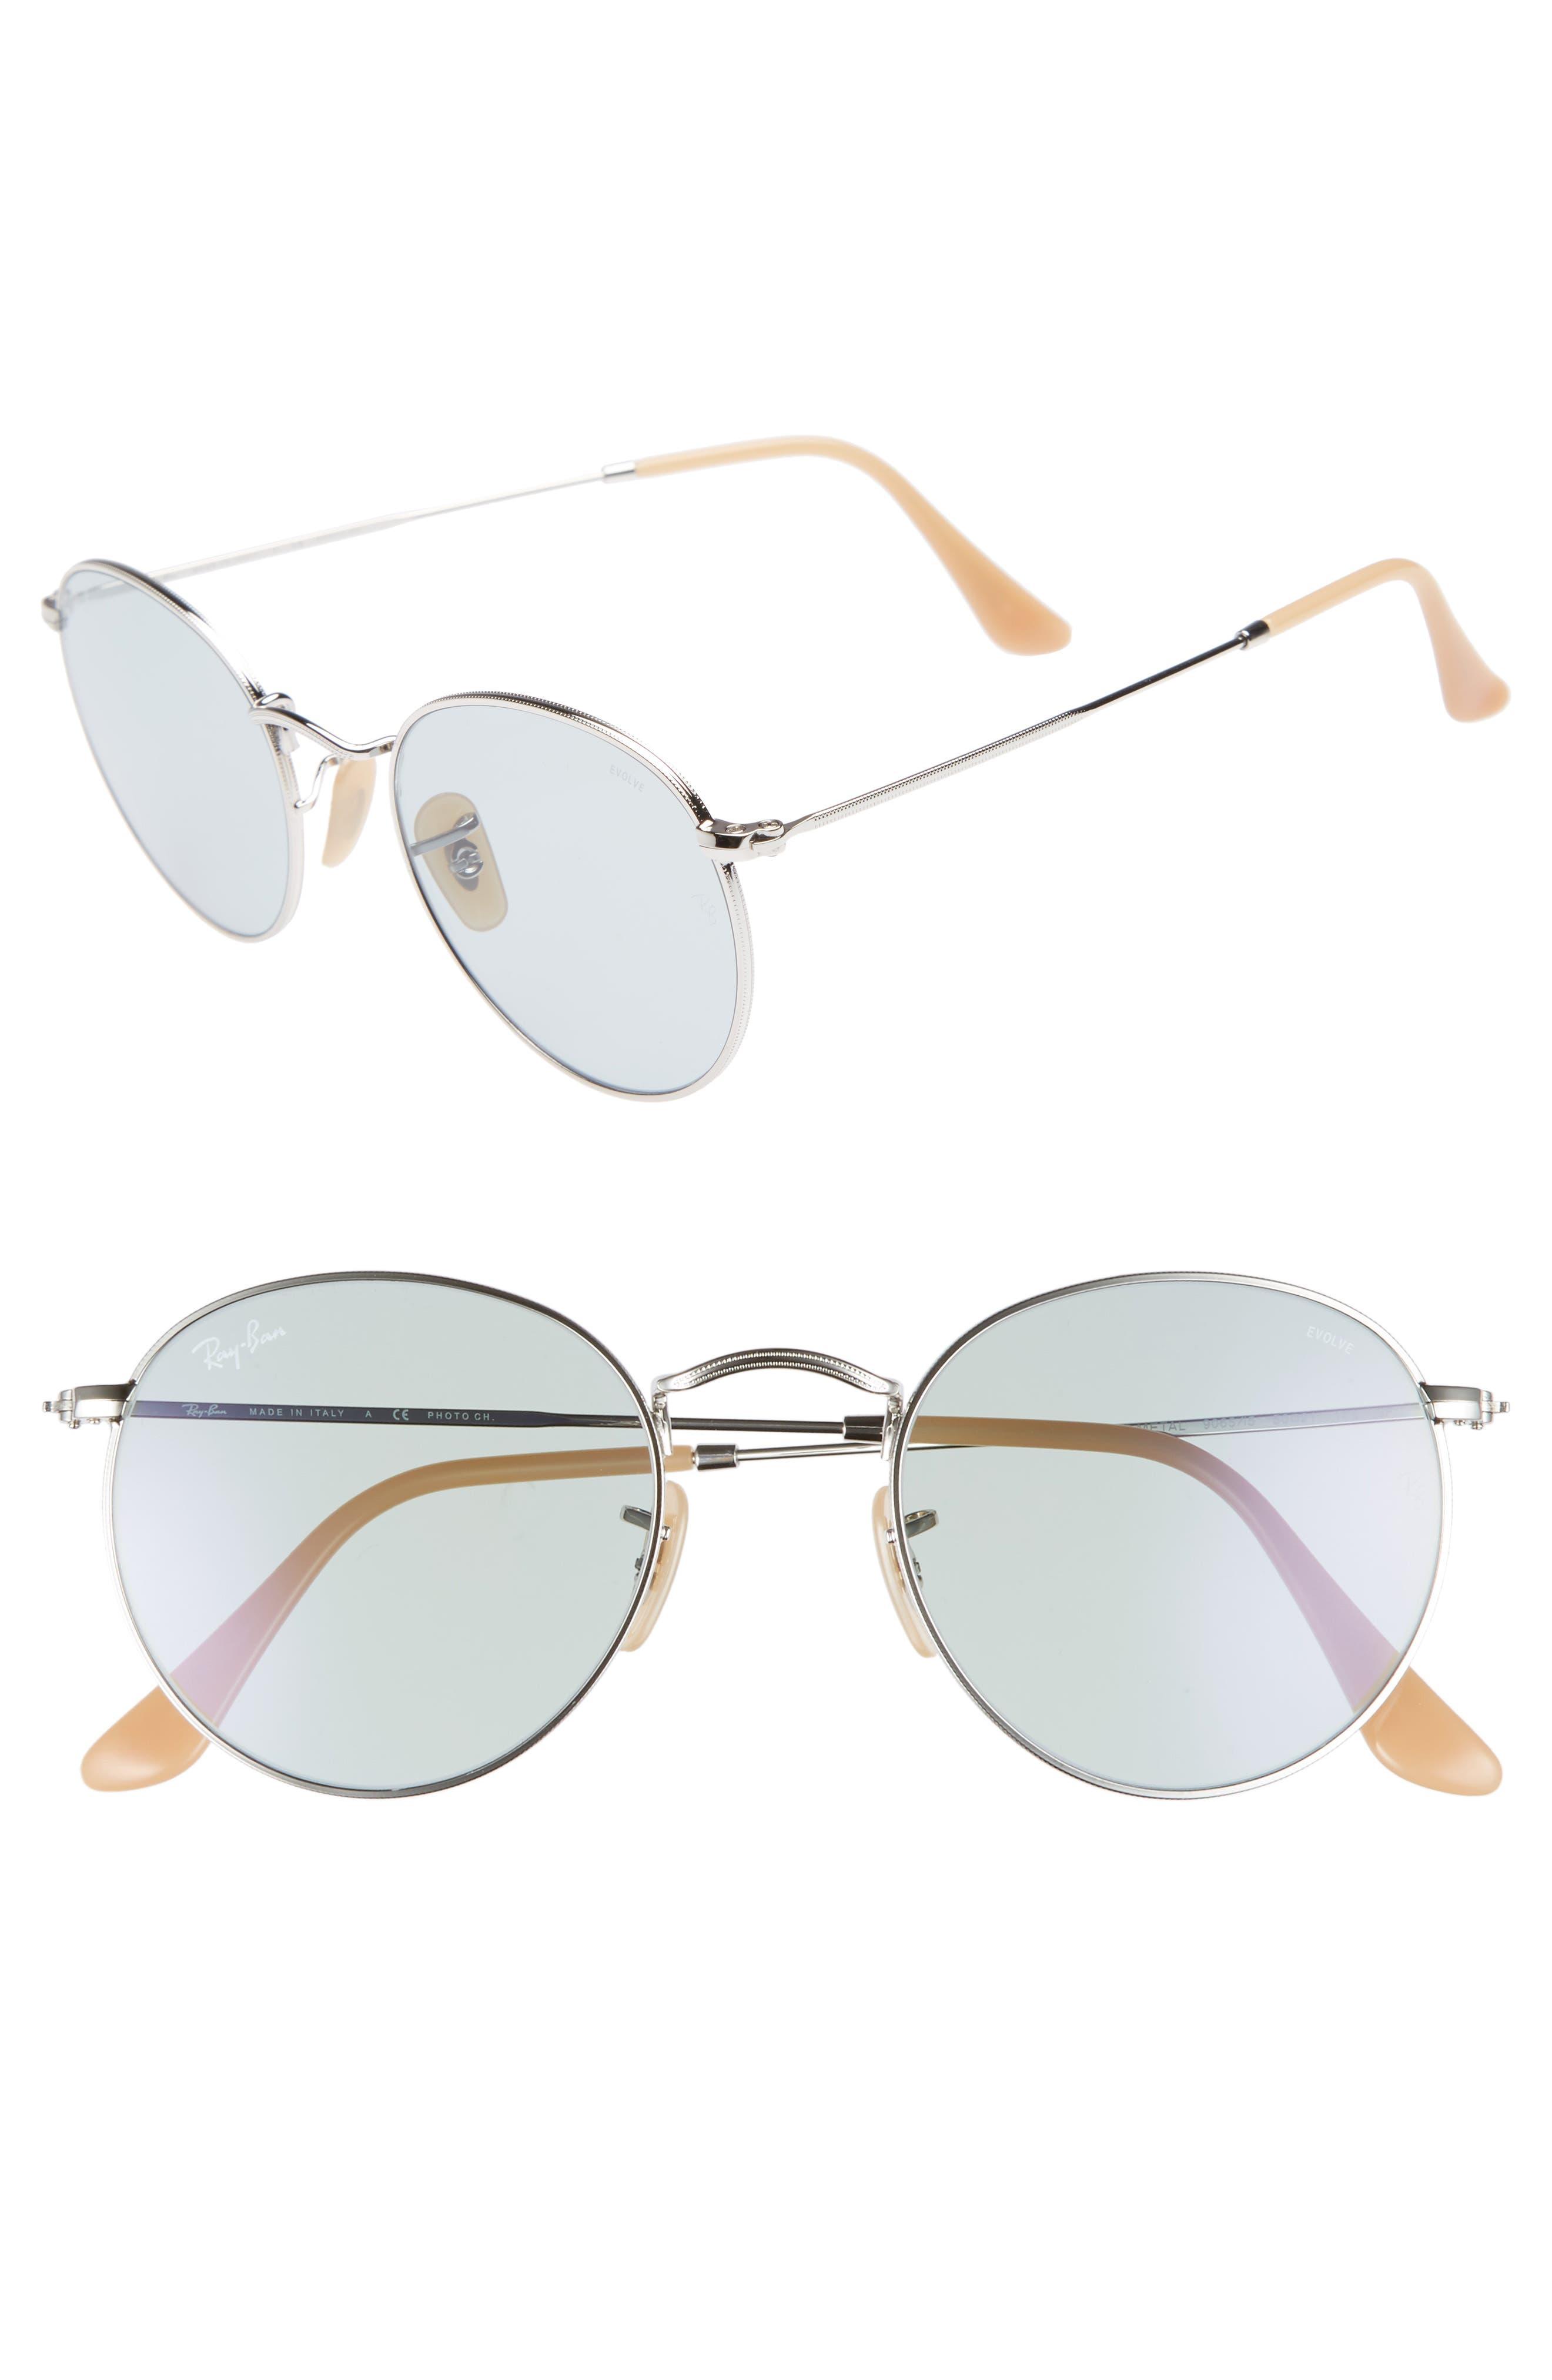 Main Image - Ray-Ban Evolve 50mm Polarized Round Sunglasses